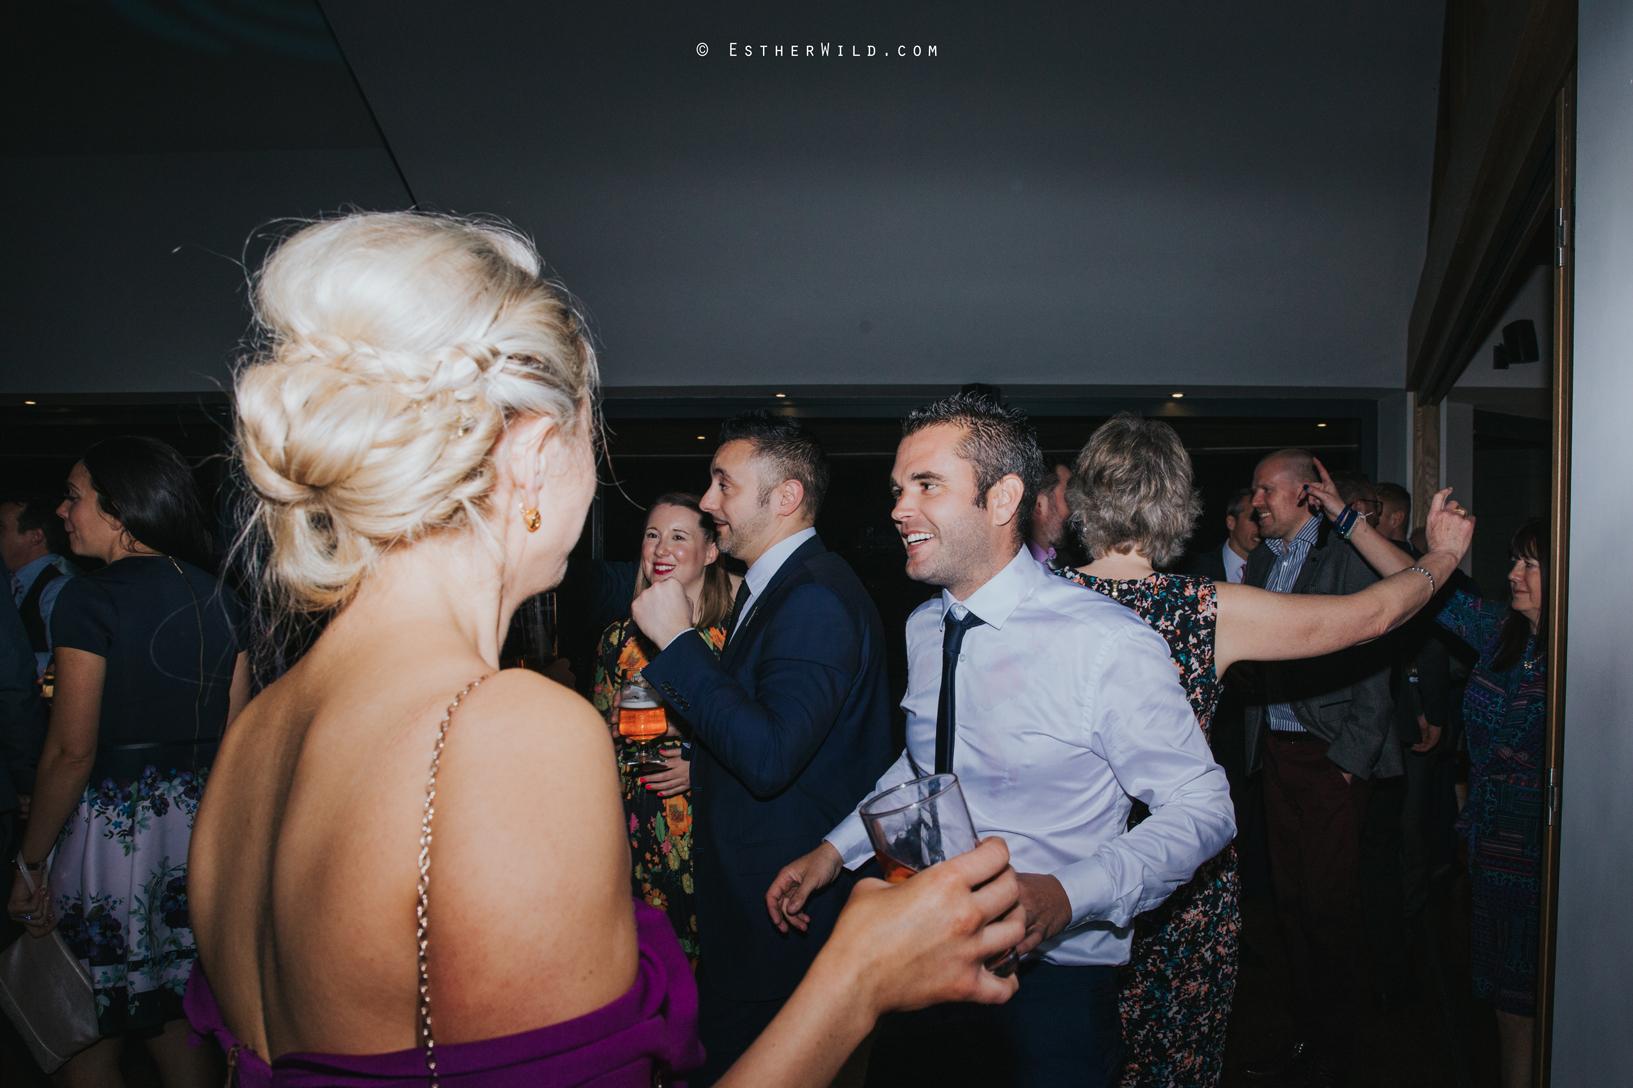 The_BoatHouse_Wedding_Venue_Ormesby_Norfolk_Broads_Boat_Wedding_Photography_Esther_Wild_Photographer_IMG_3646.jpg